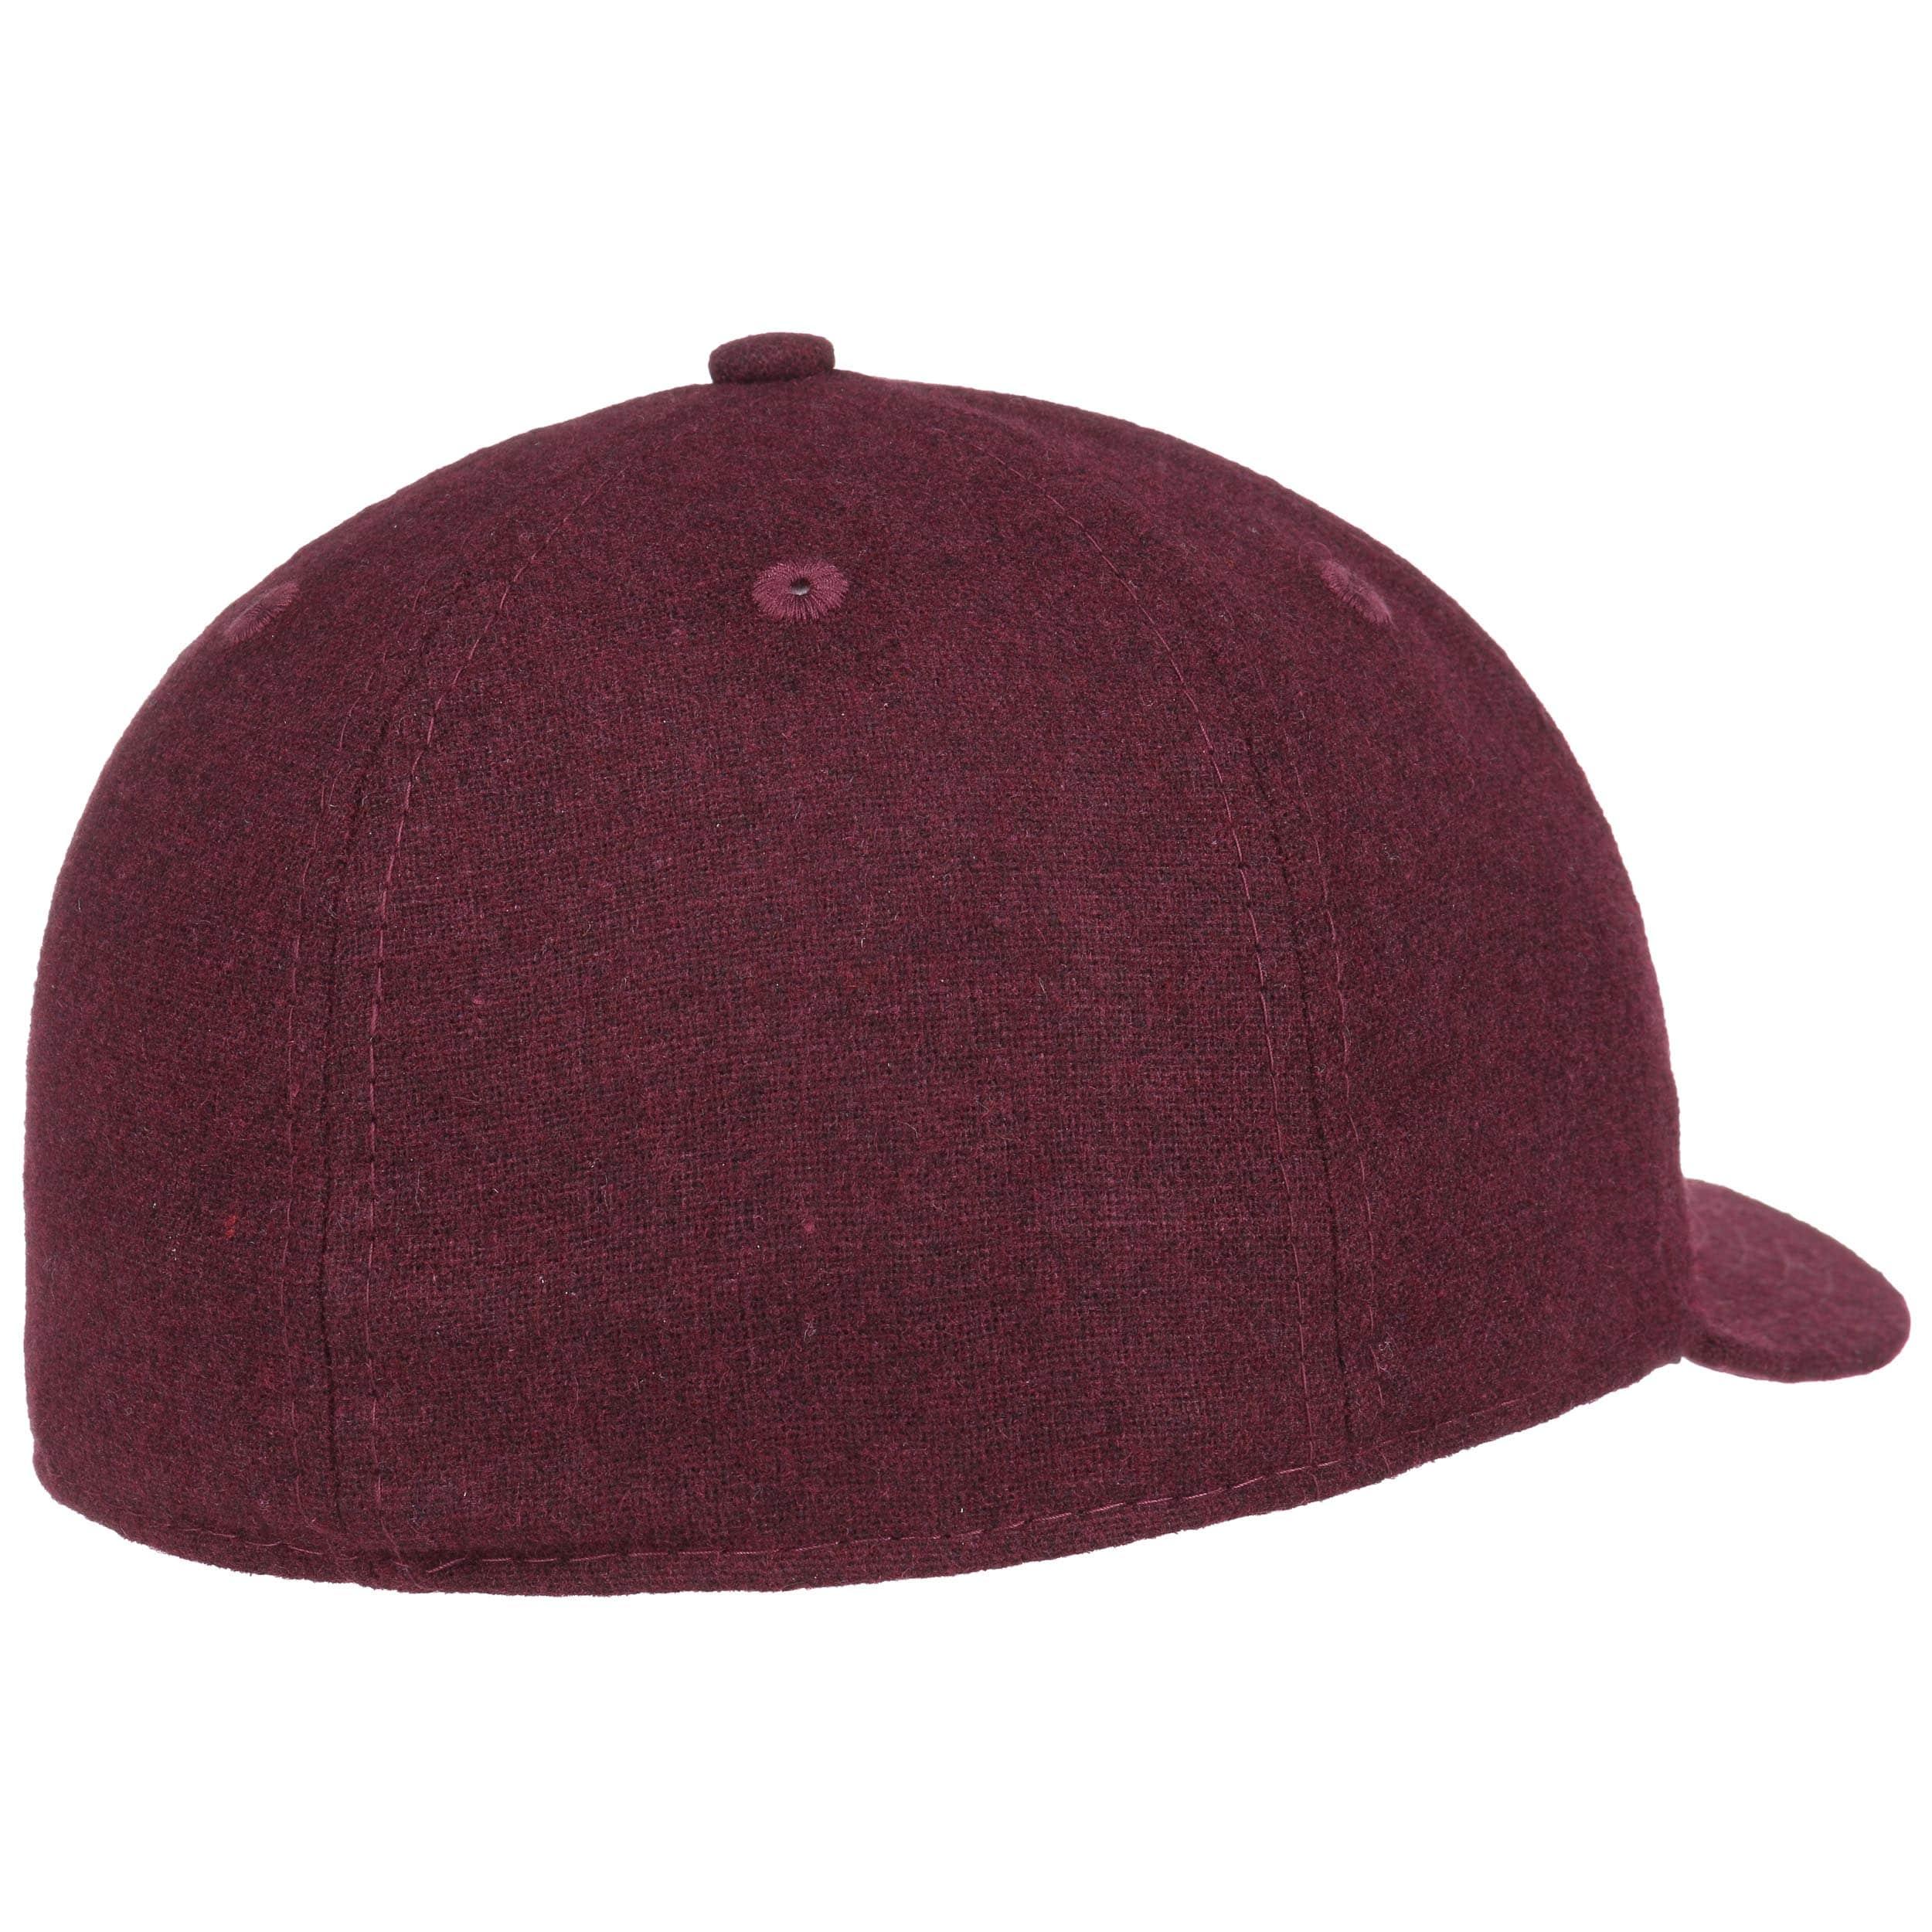 fa7a832e1de11d ... clearance 59fifty low profile pin cavs cap by new era bordeaux 3 d172e  1be2a